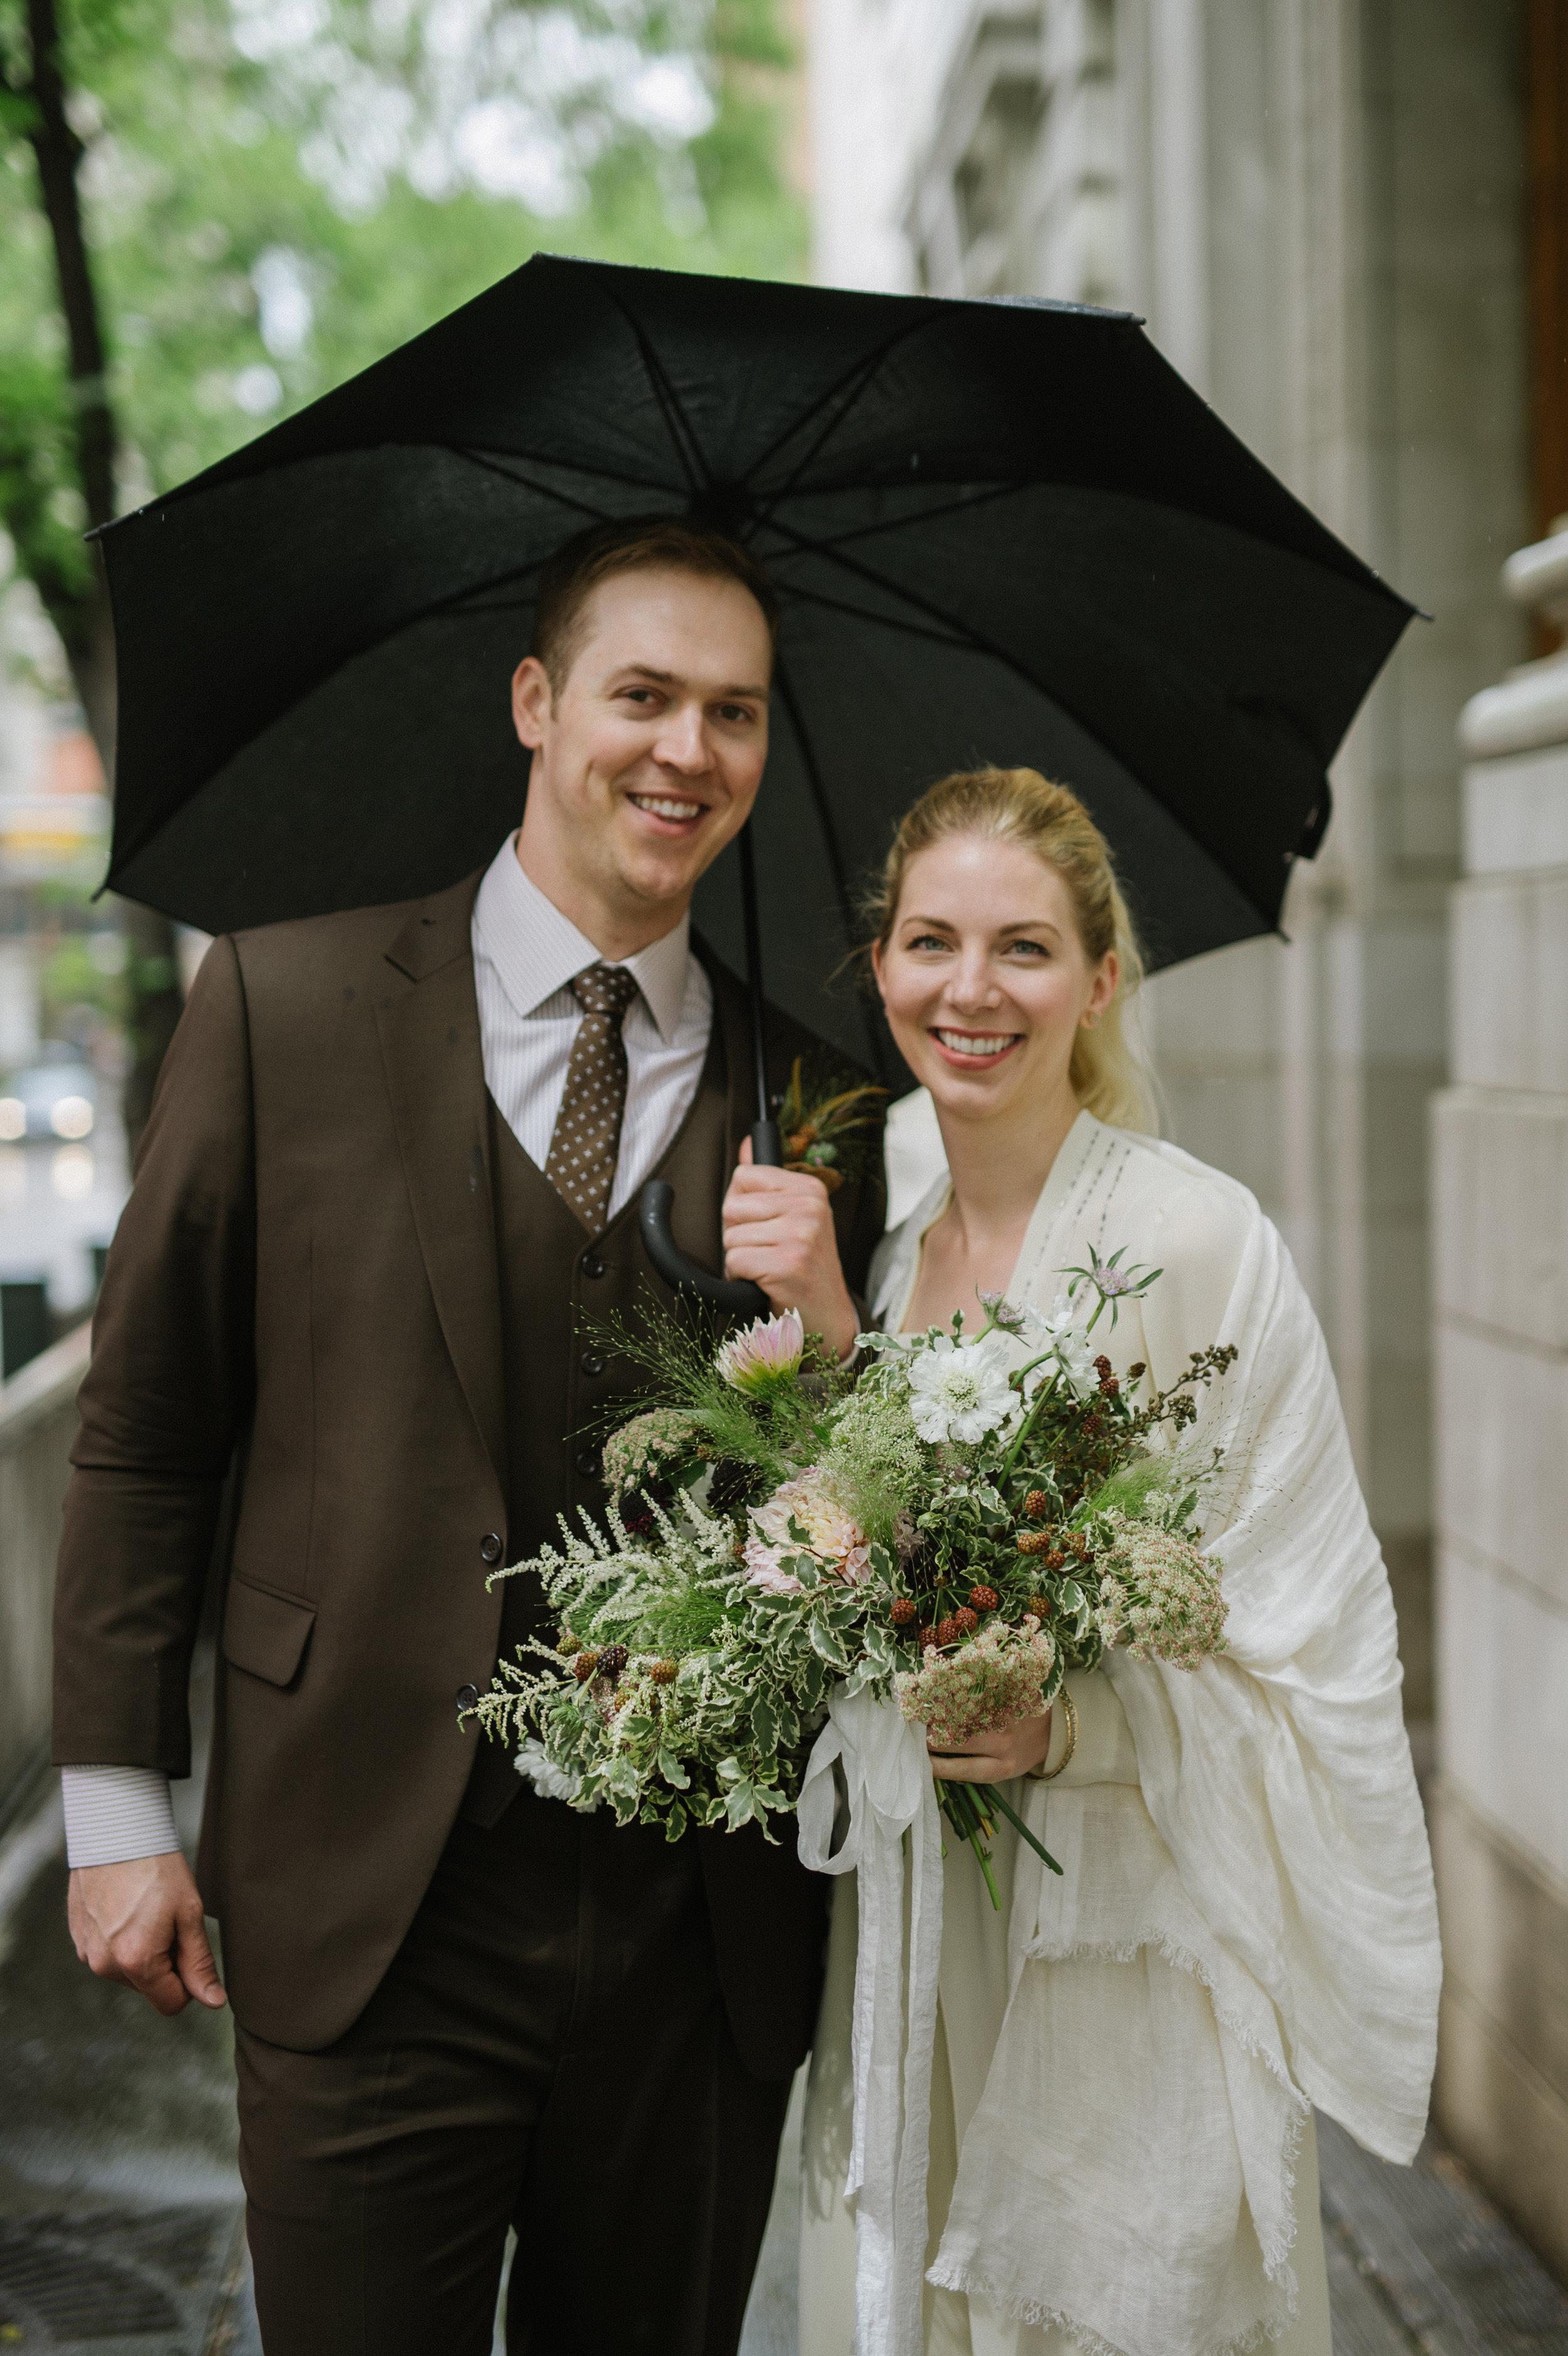 Teatro_Wedding_Calgary_Wedding_Photography_Vanessa_Tom_Married_2018_HR206.jpg